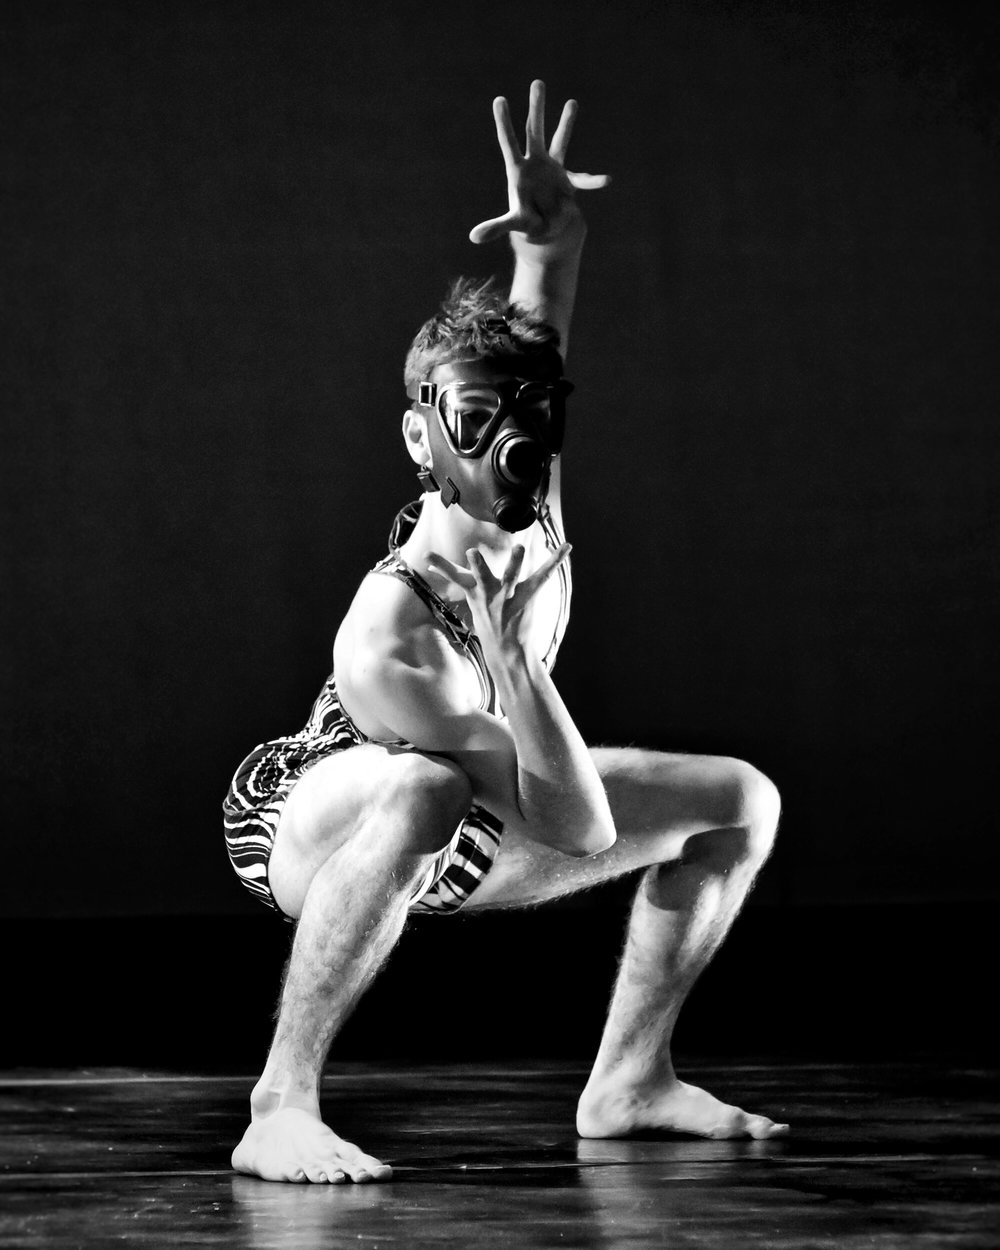 Lounes Landri. Photo by Peter Hinsdale